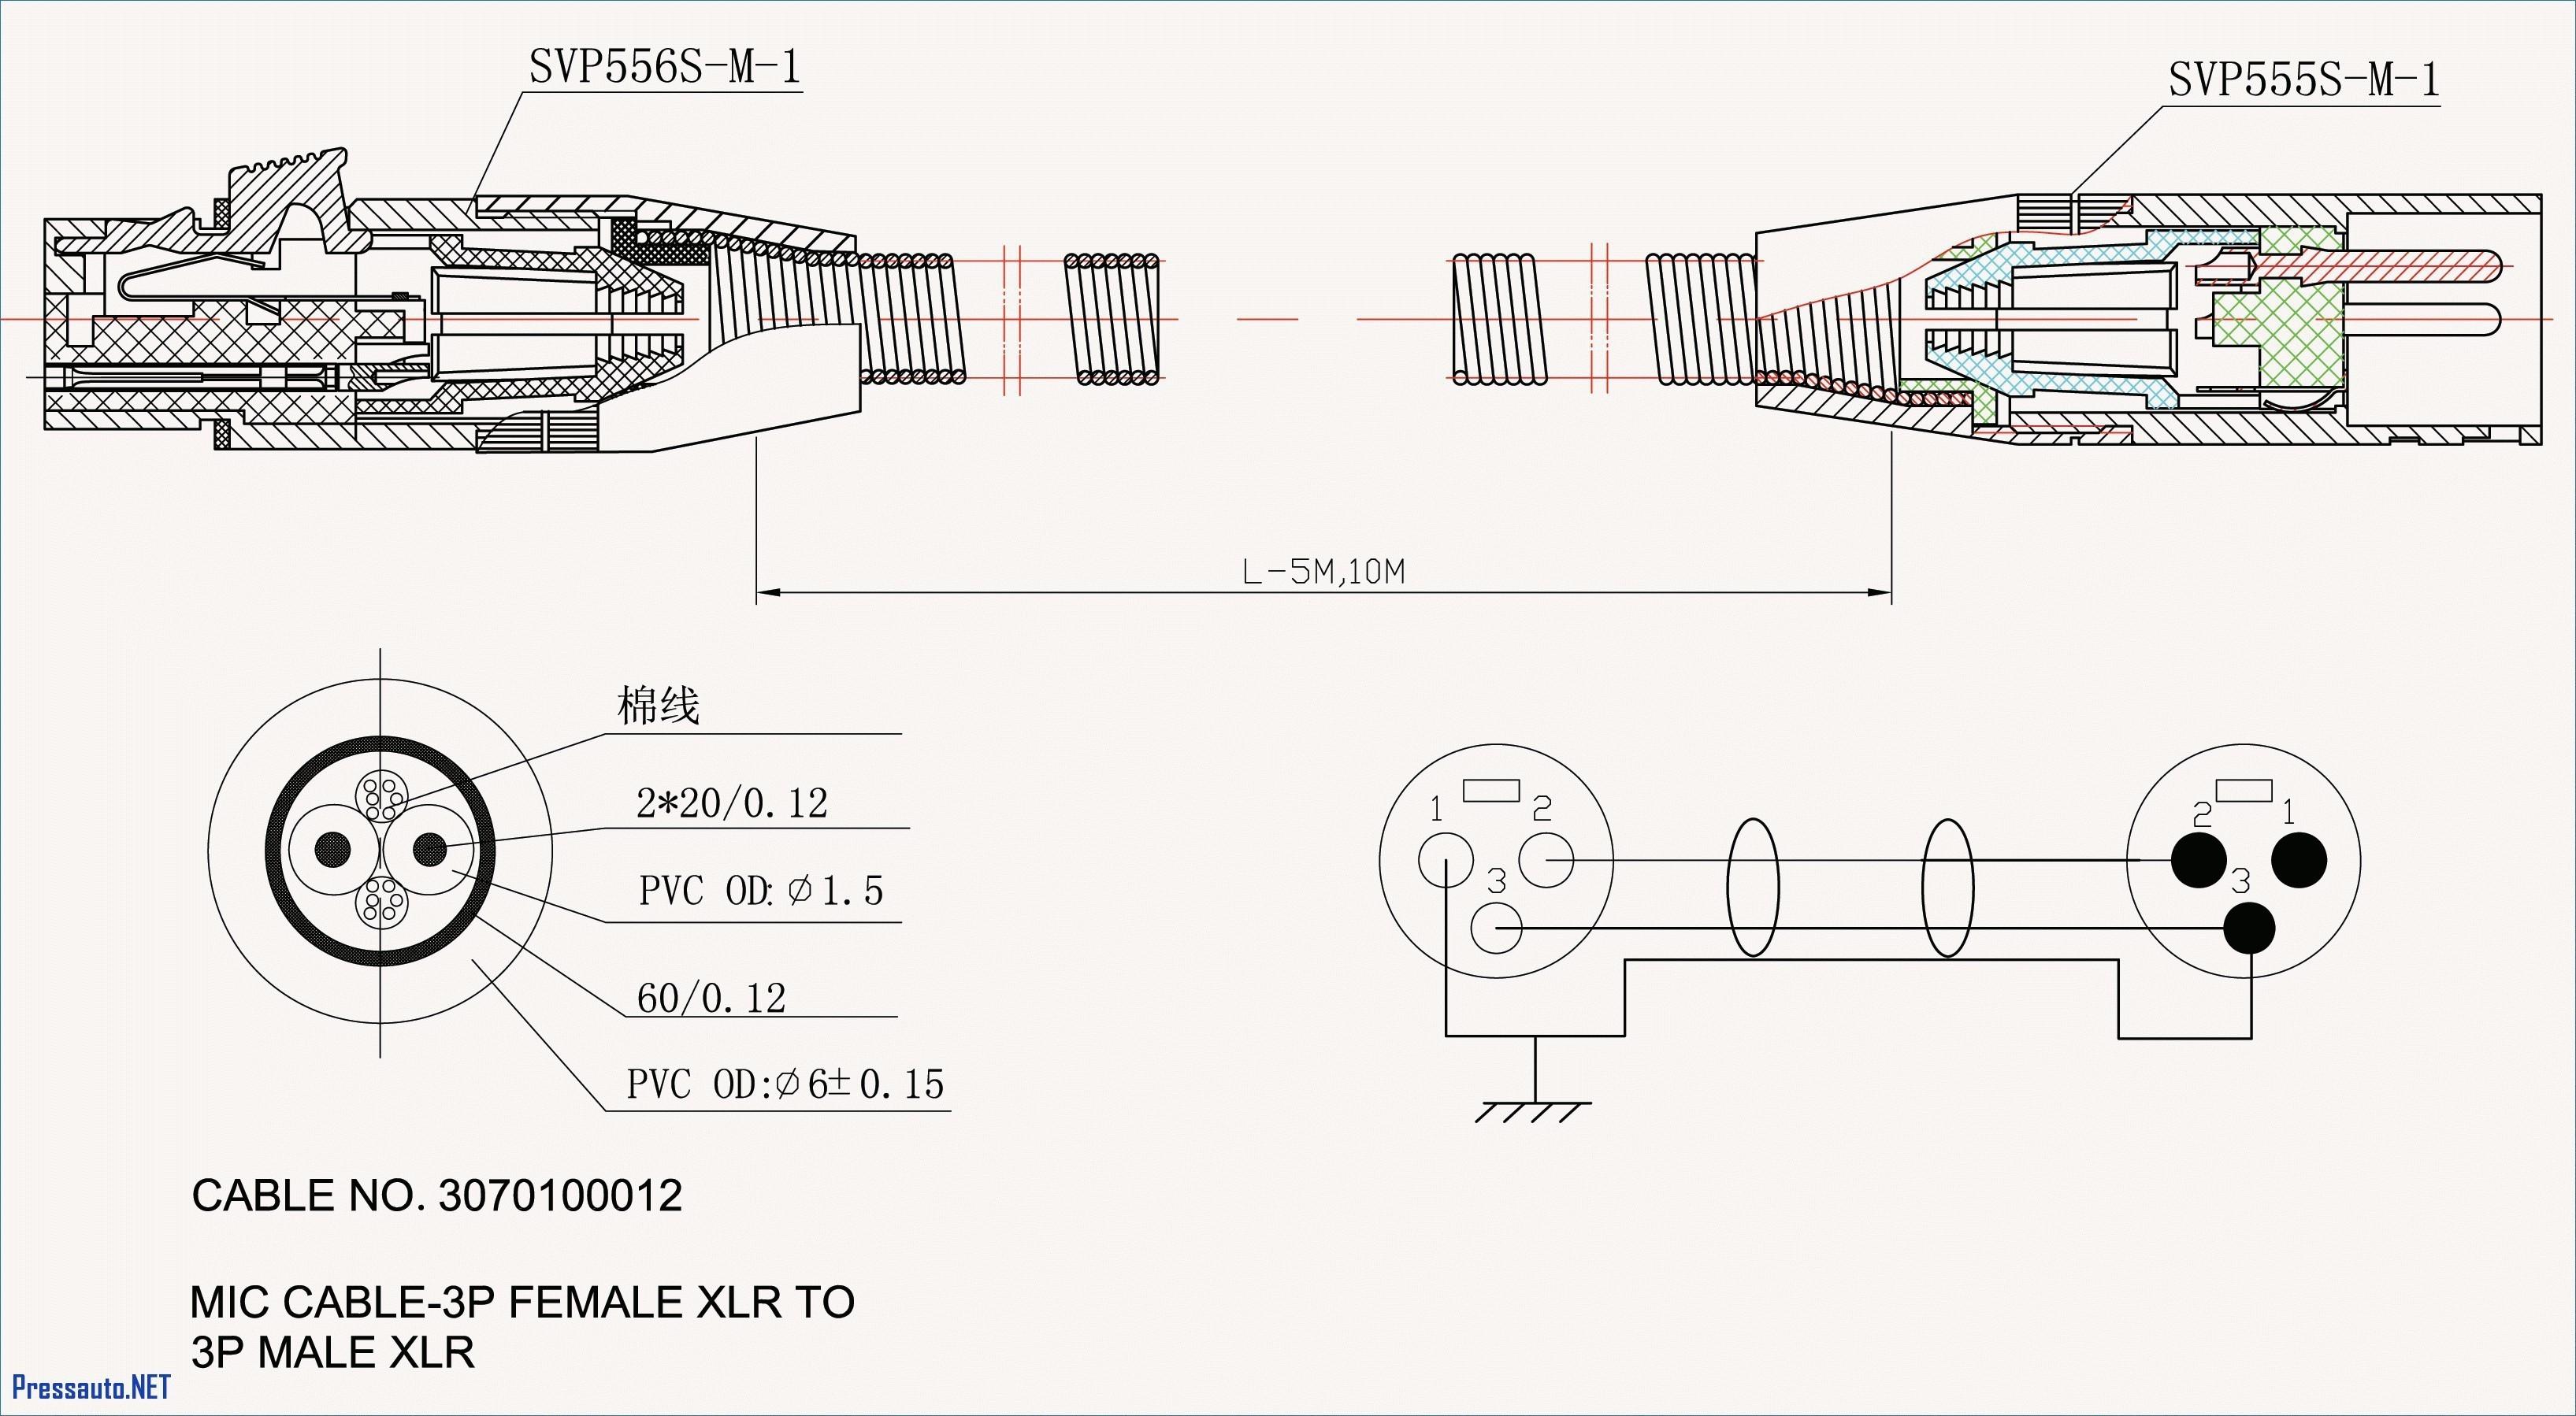 2002 Subaru Wrx Engine Diagram Subaru Alternator Diagram Layout Wiring Diagrams • Of 2002 Subaru Wrx Engine Diagram